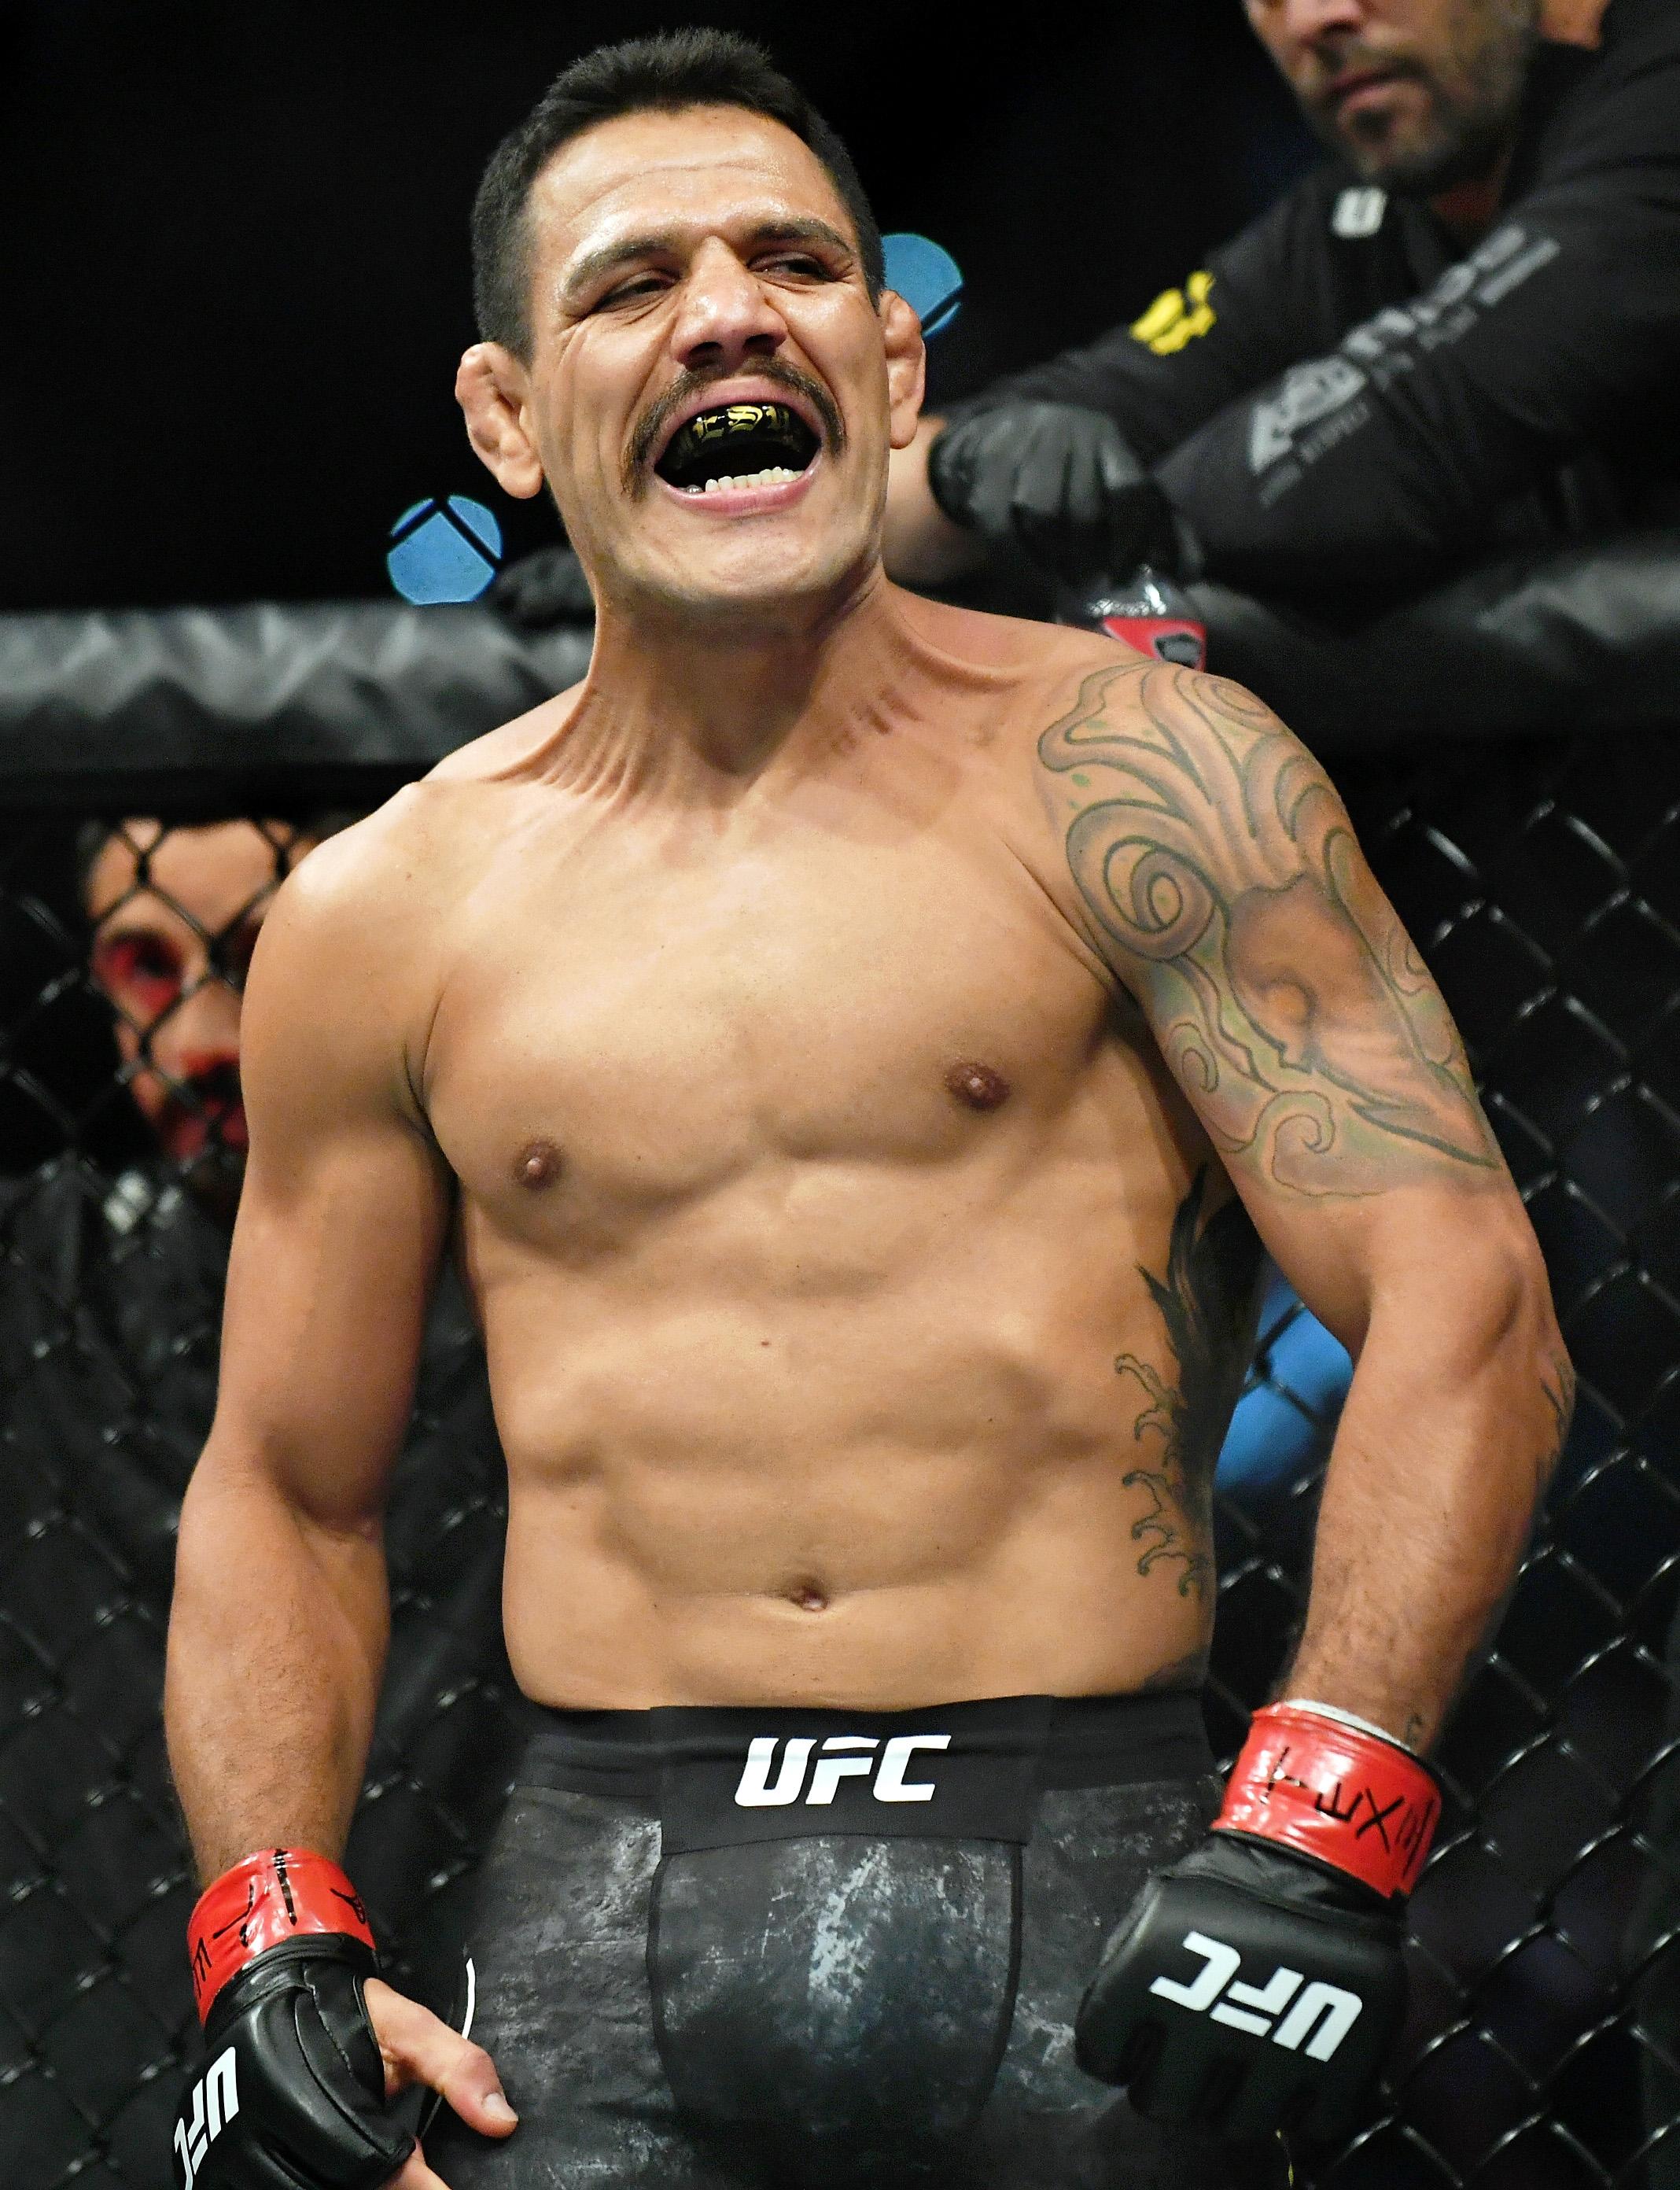 MMA: UFC Fight Night-San Antonio-Dos Anjos vs Edwards